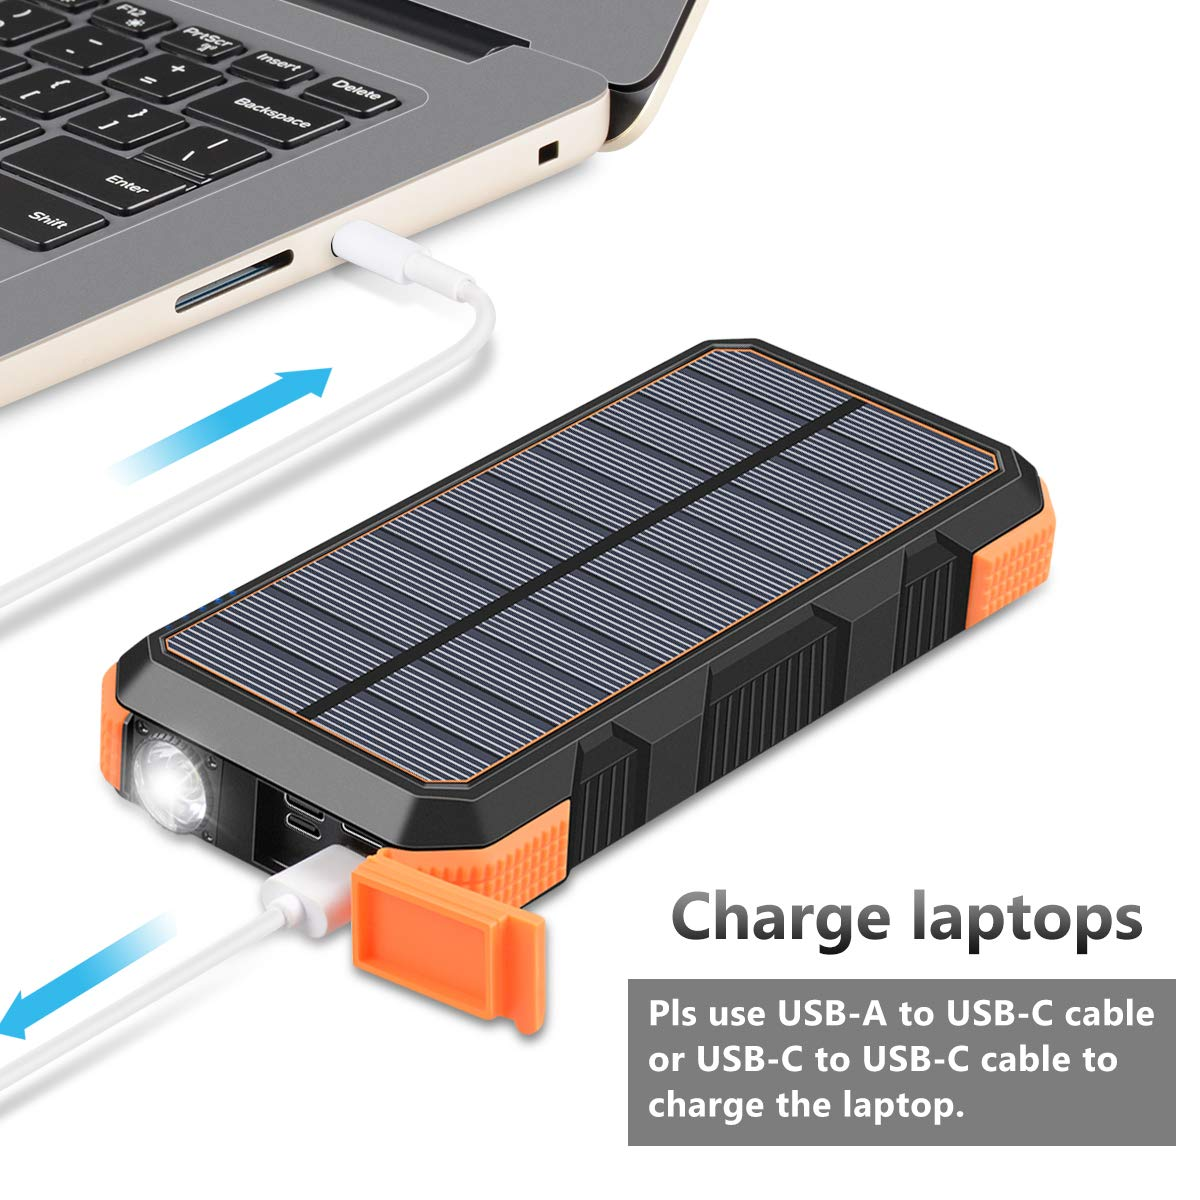 Cargador Solar Portatil 26800mah Para Laptop Macbook Usb-c